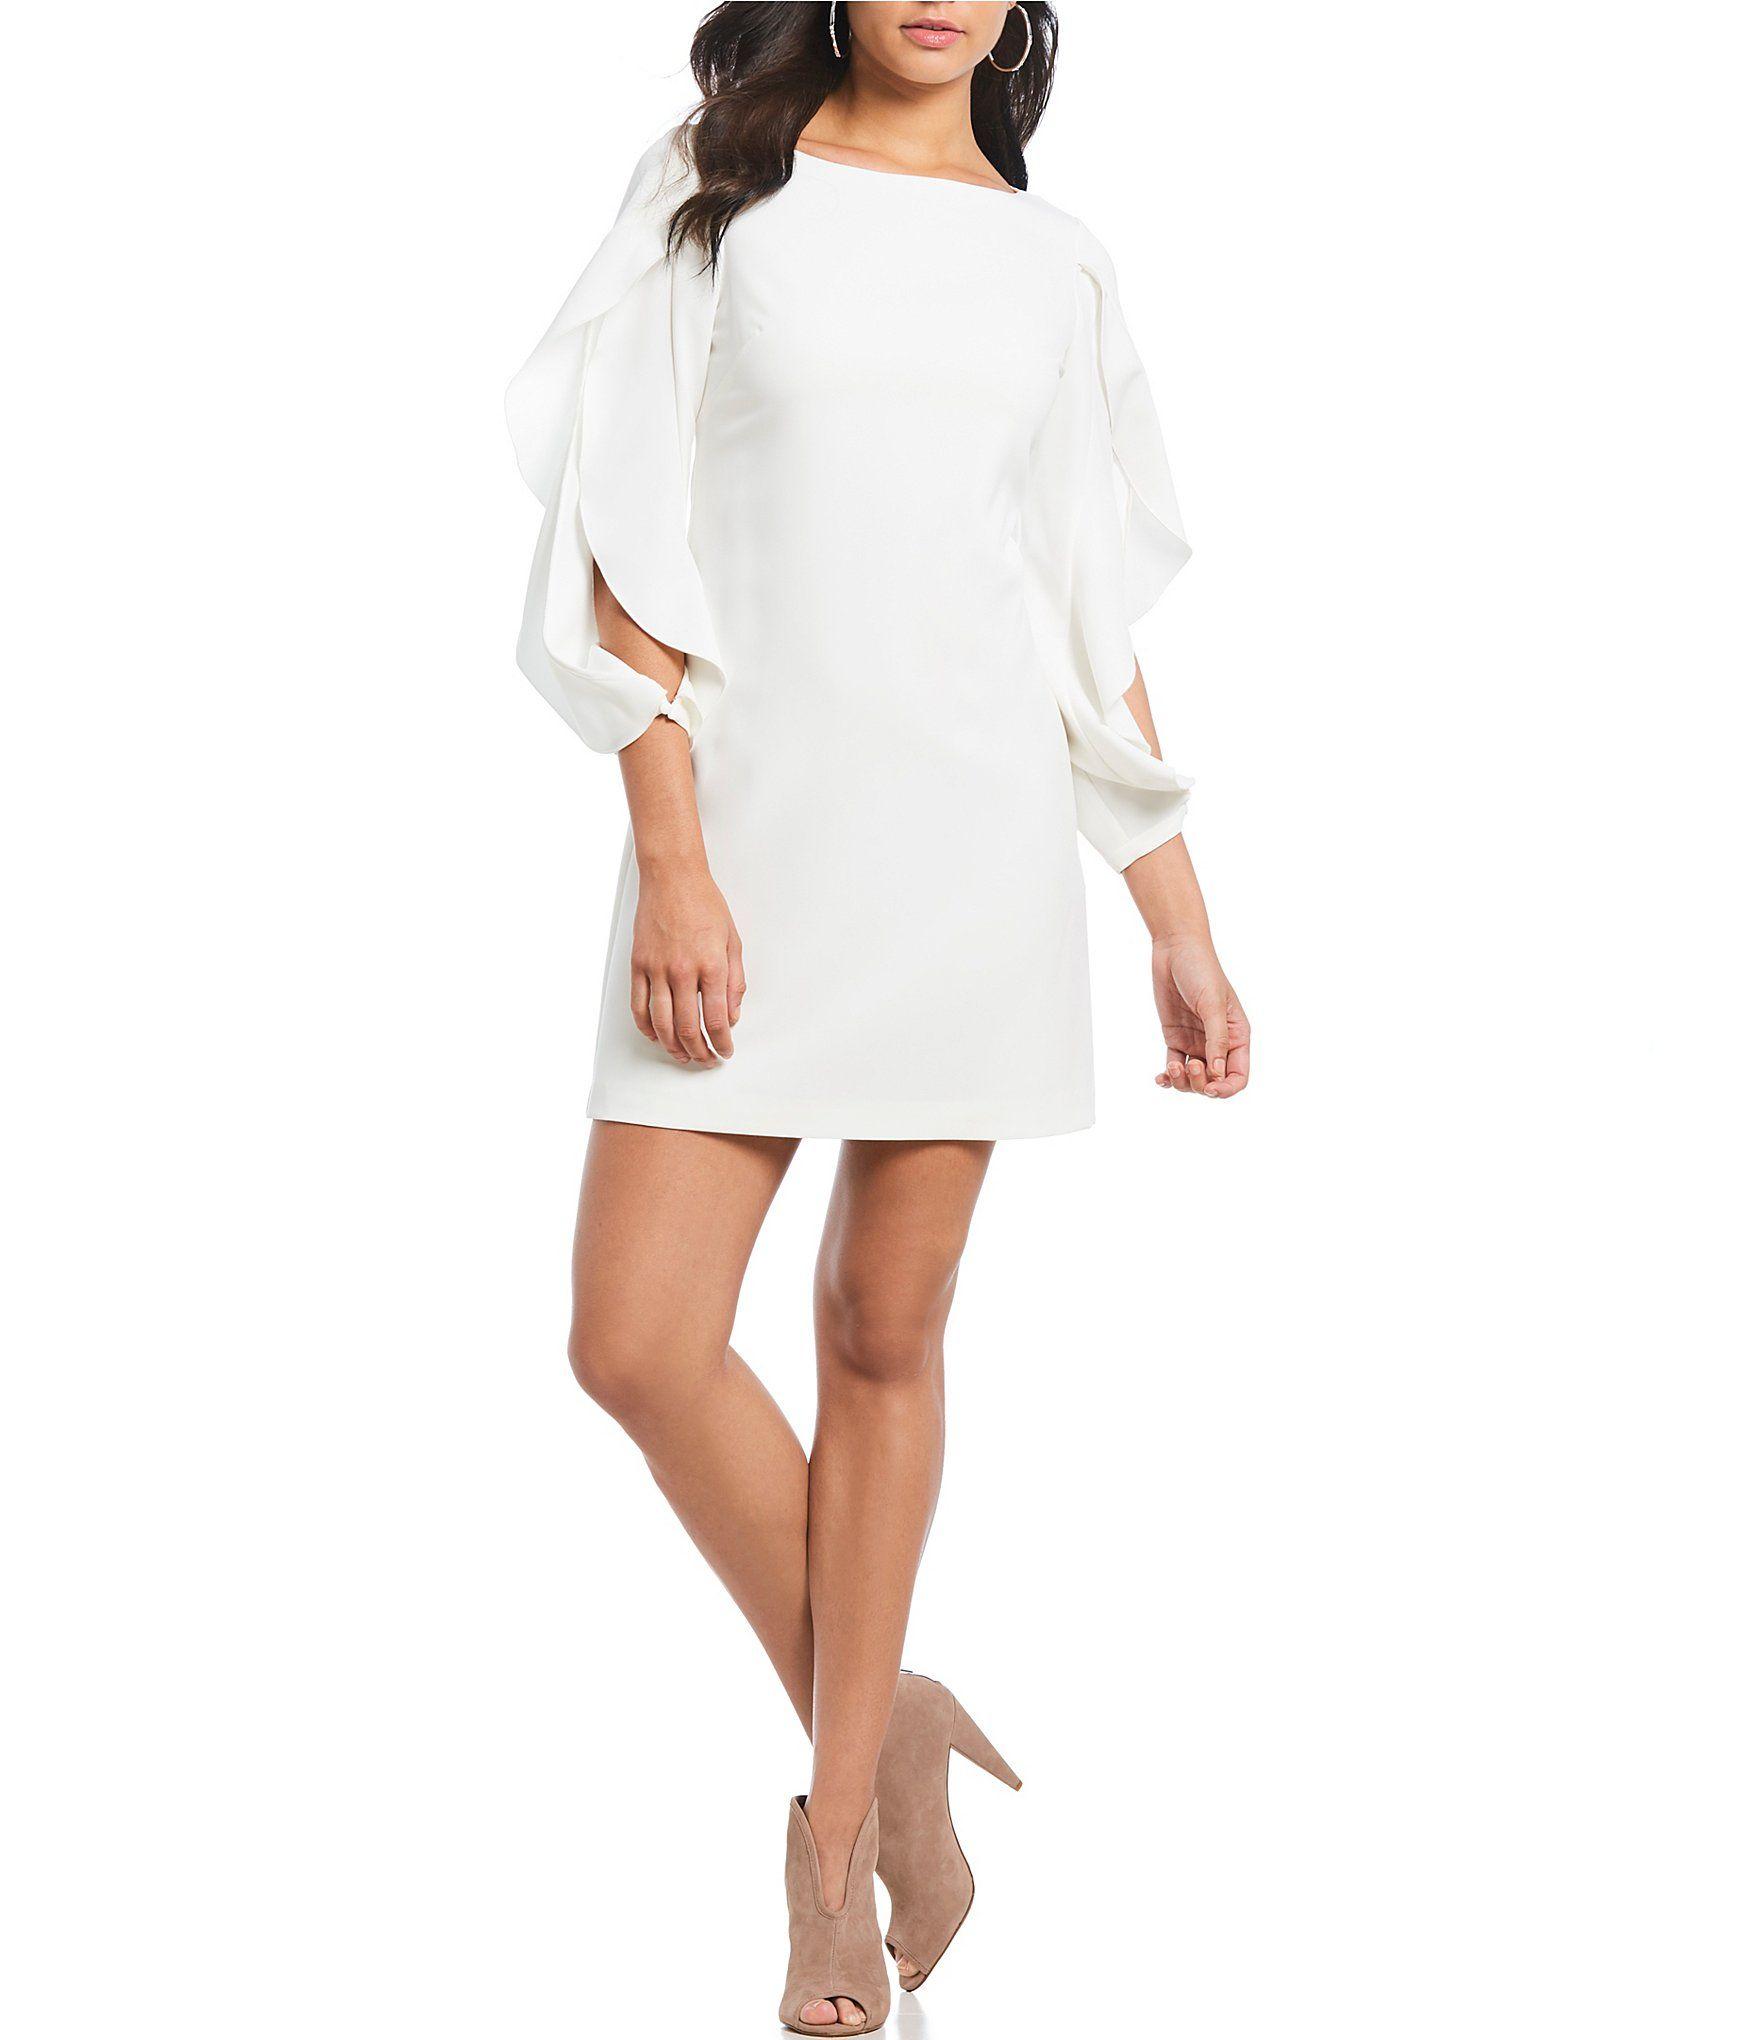 6ce1b1afa0d Advertisement  Shop for Vince Camuto Ruffle Split Sleeve Shift Dress at  Dillards.com. Visit Dillards